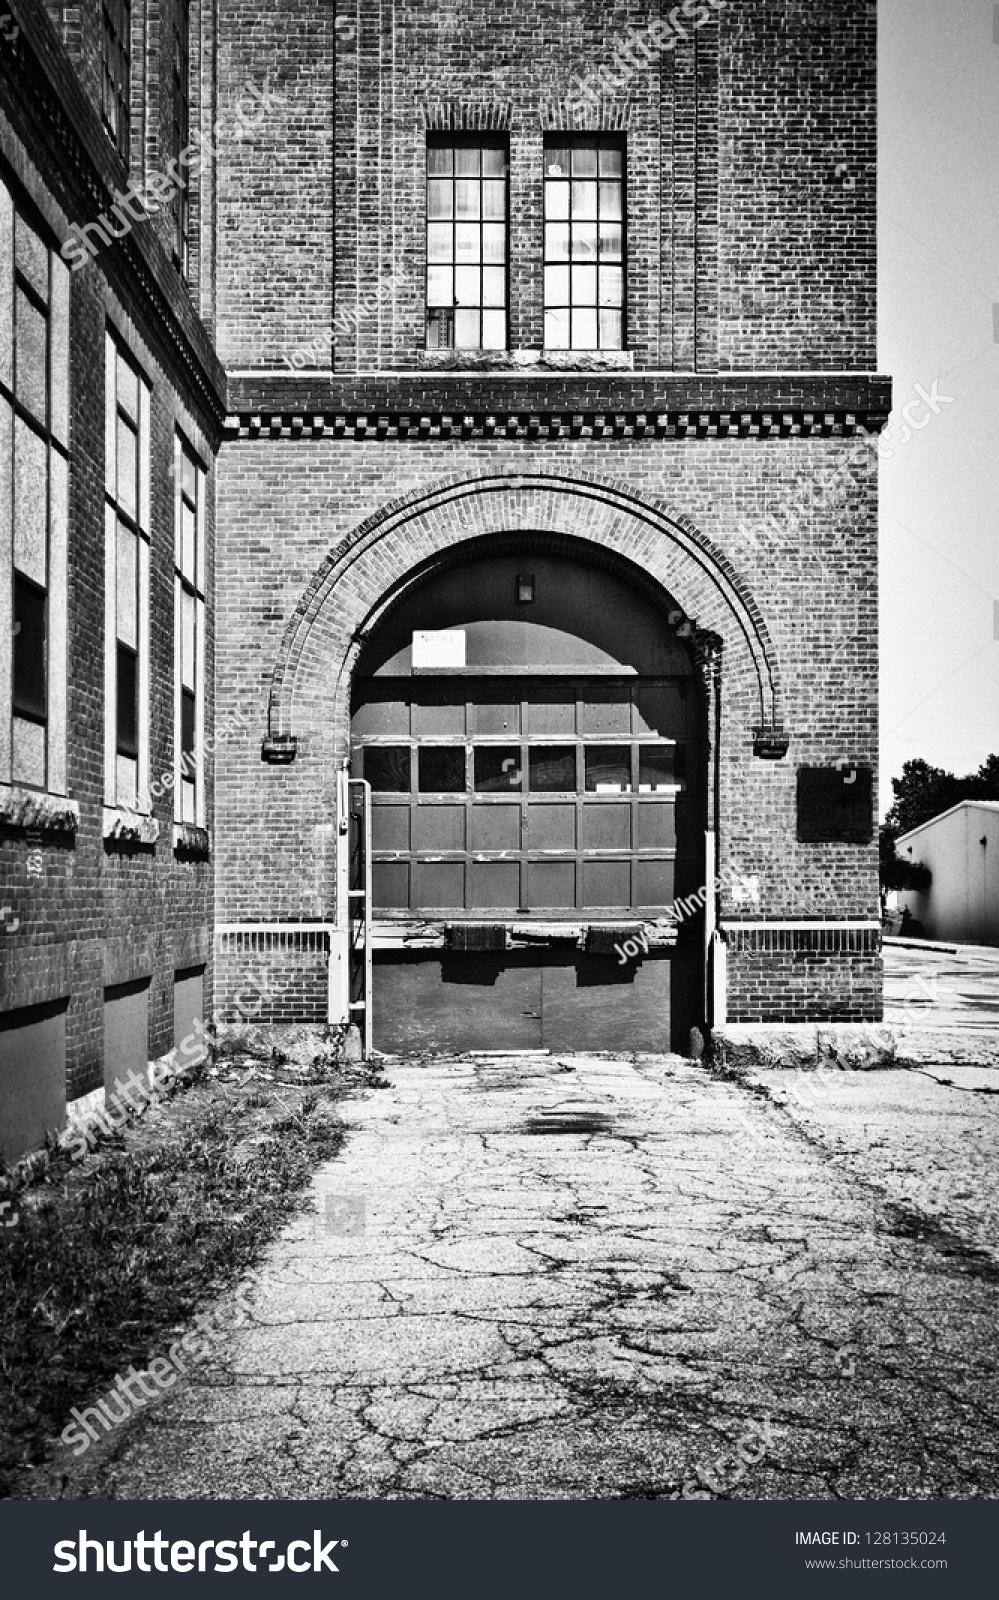 Urban Garage Door City Setting Stock Photo 128135024 Shutterstock